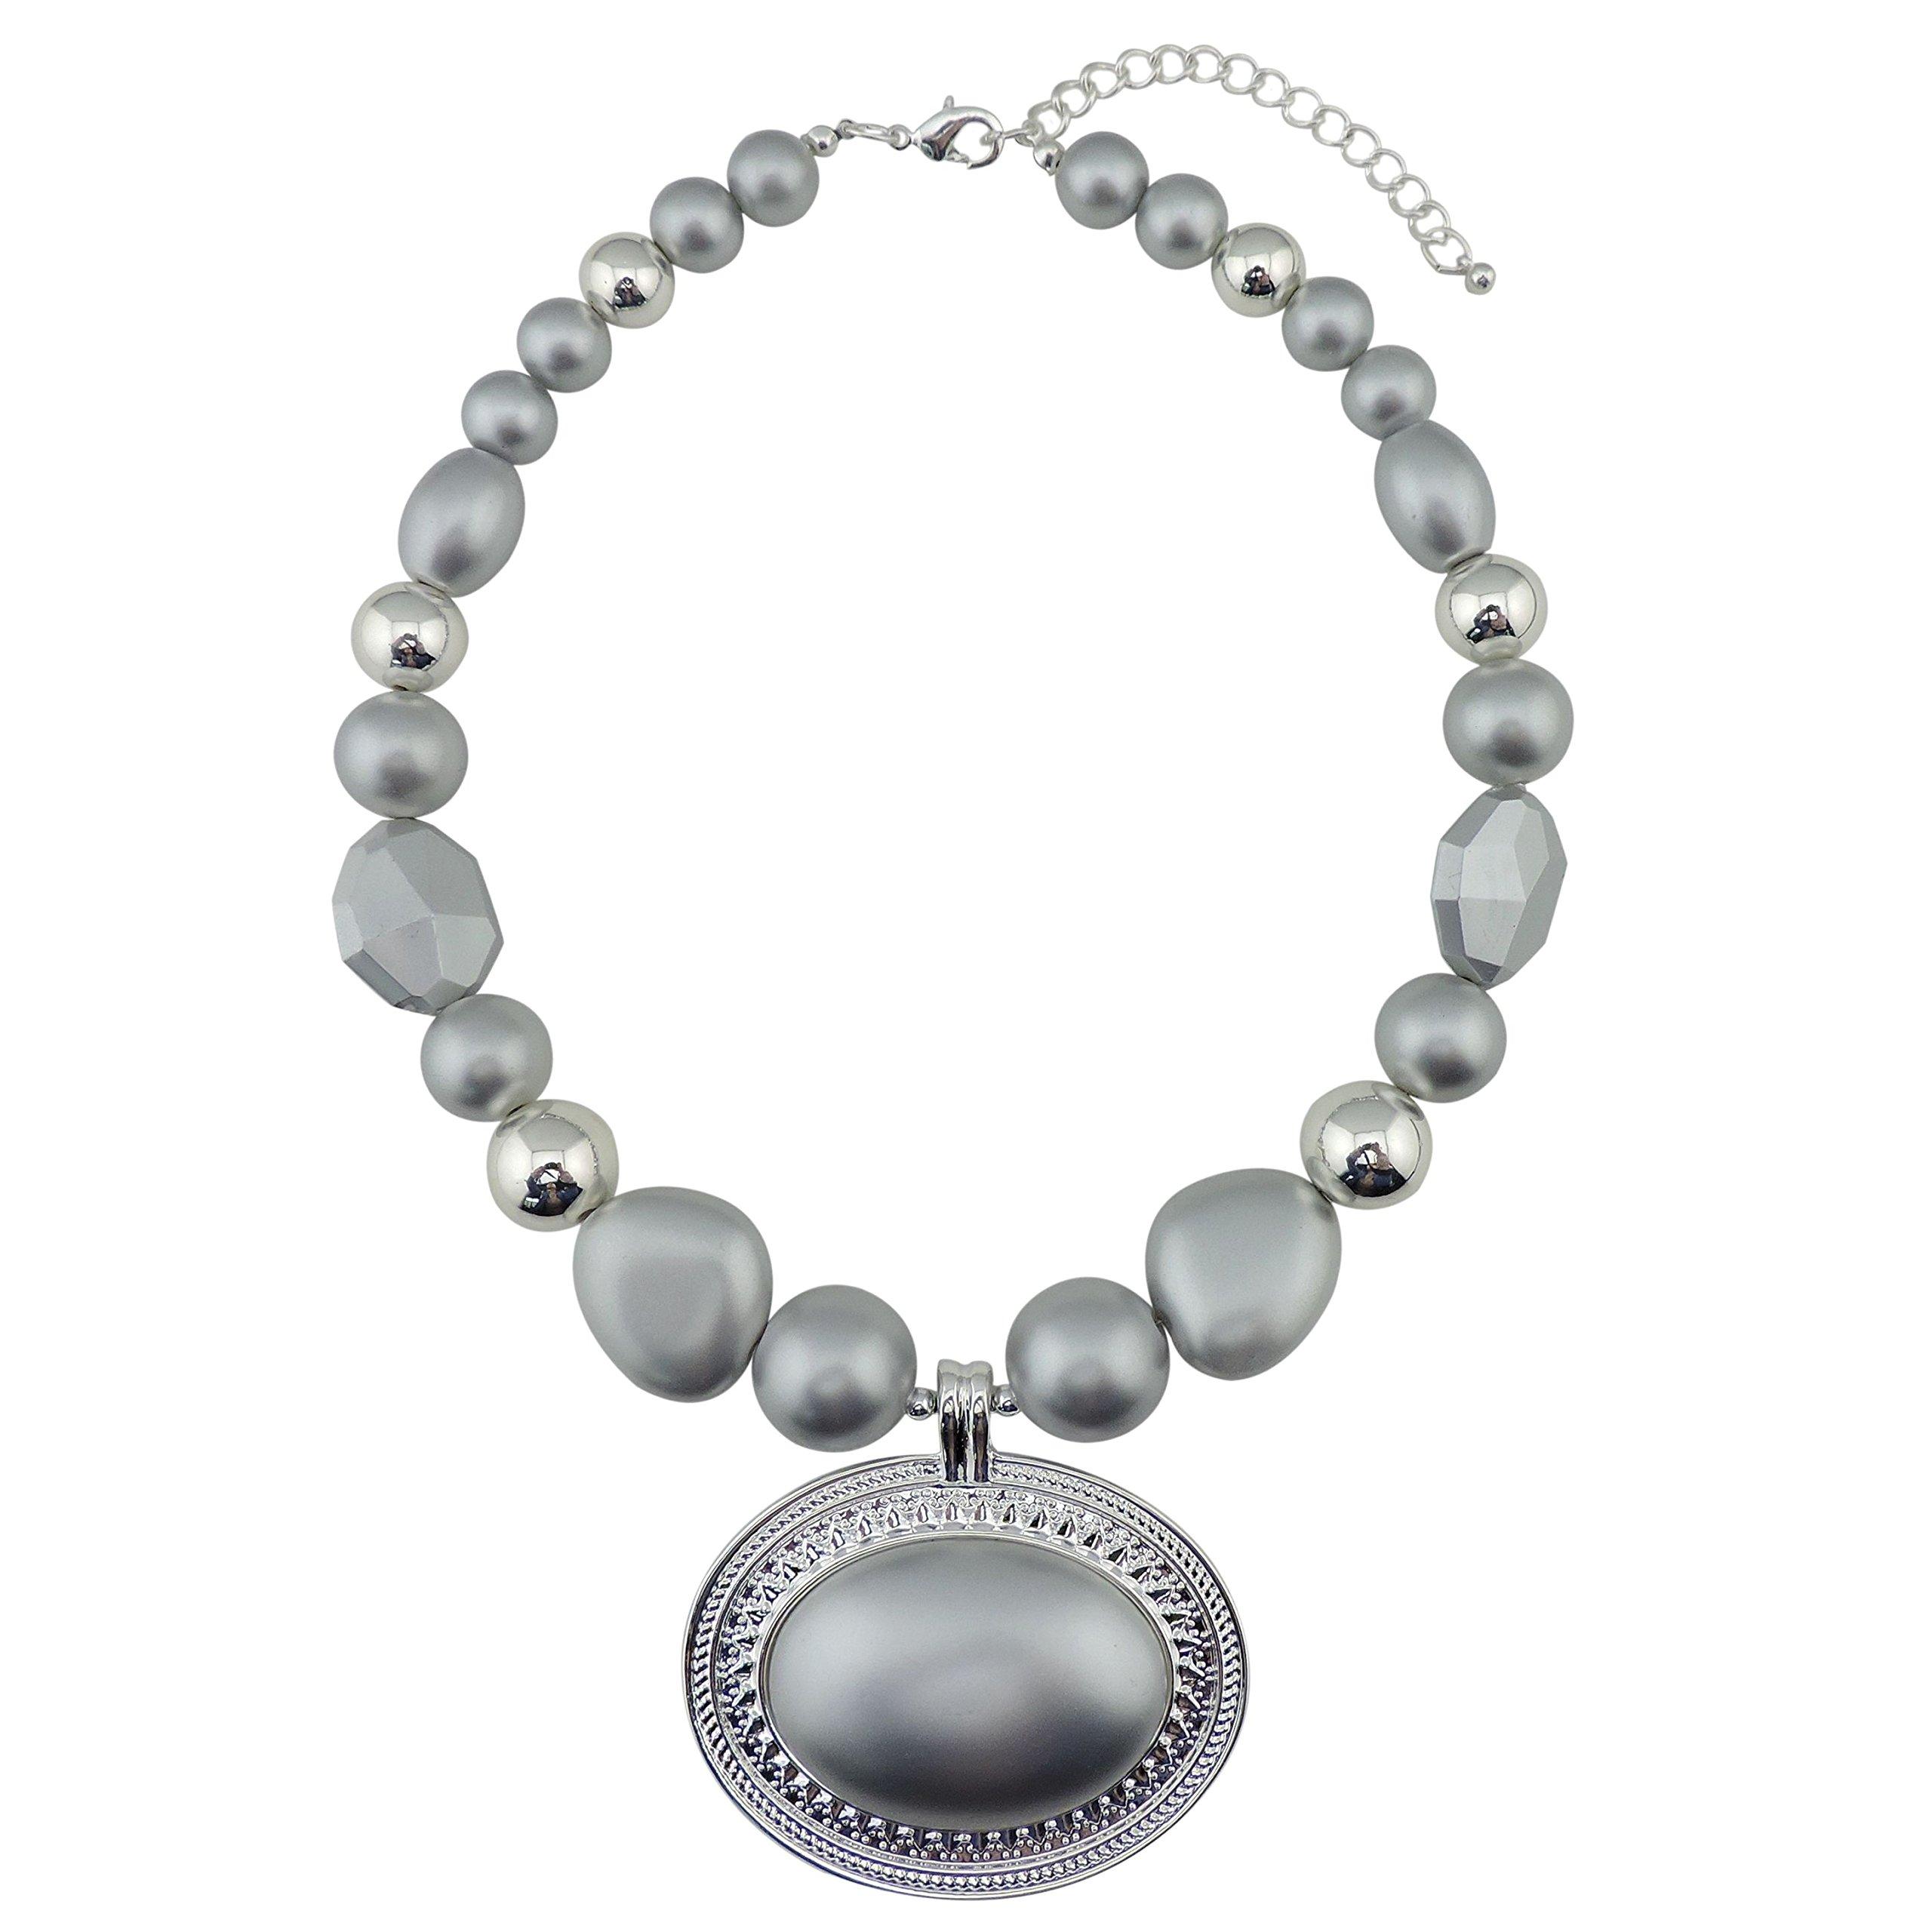 BOCAR Statement Beads Chunky Collar Pendant Necklace (NK-10420-matt silver)